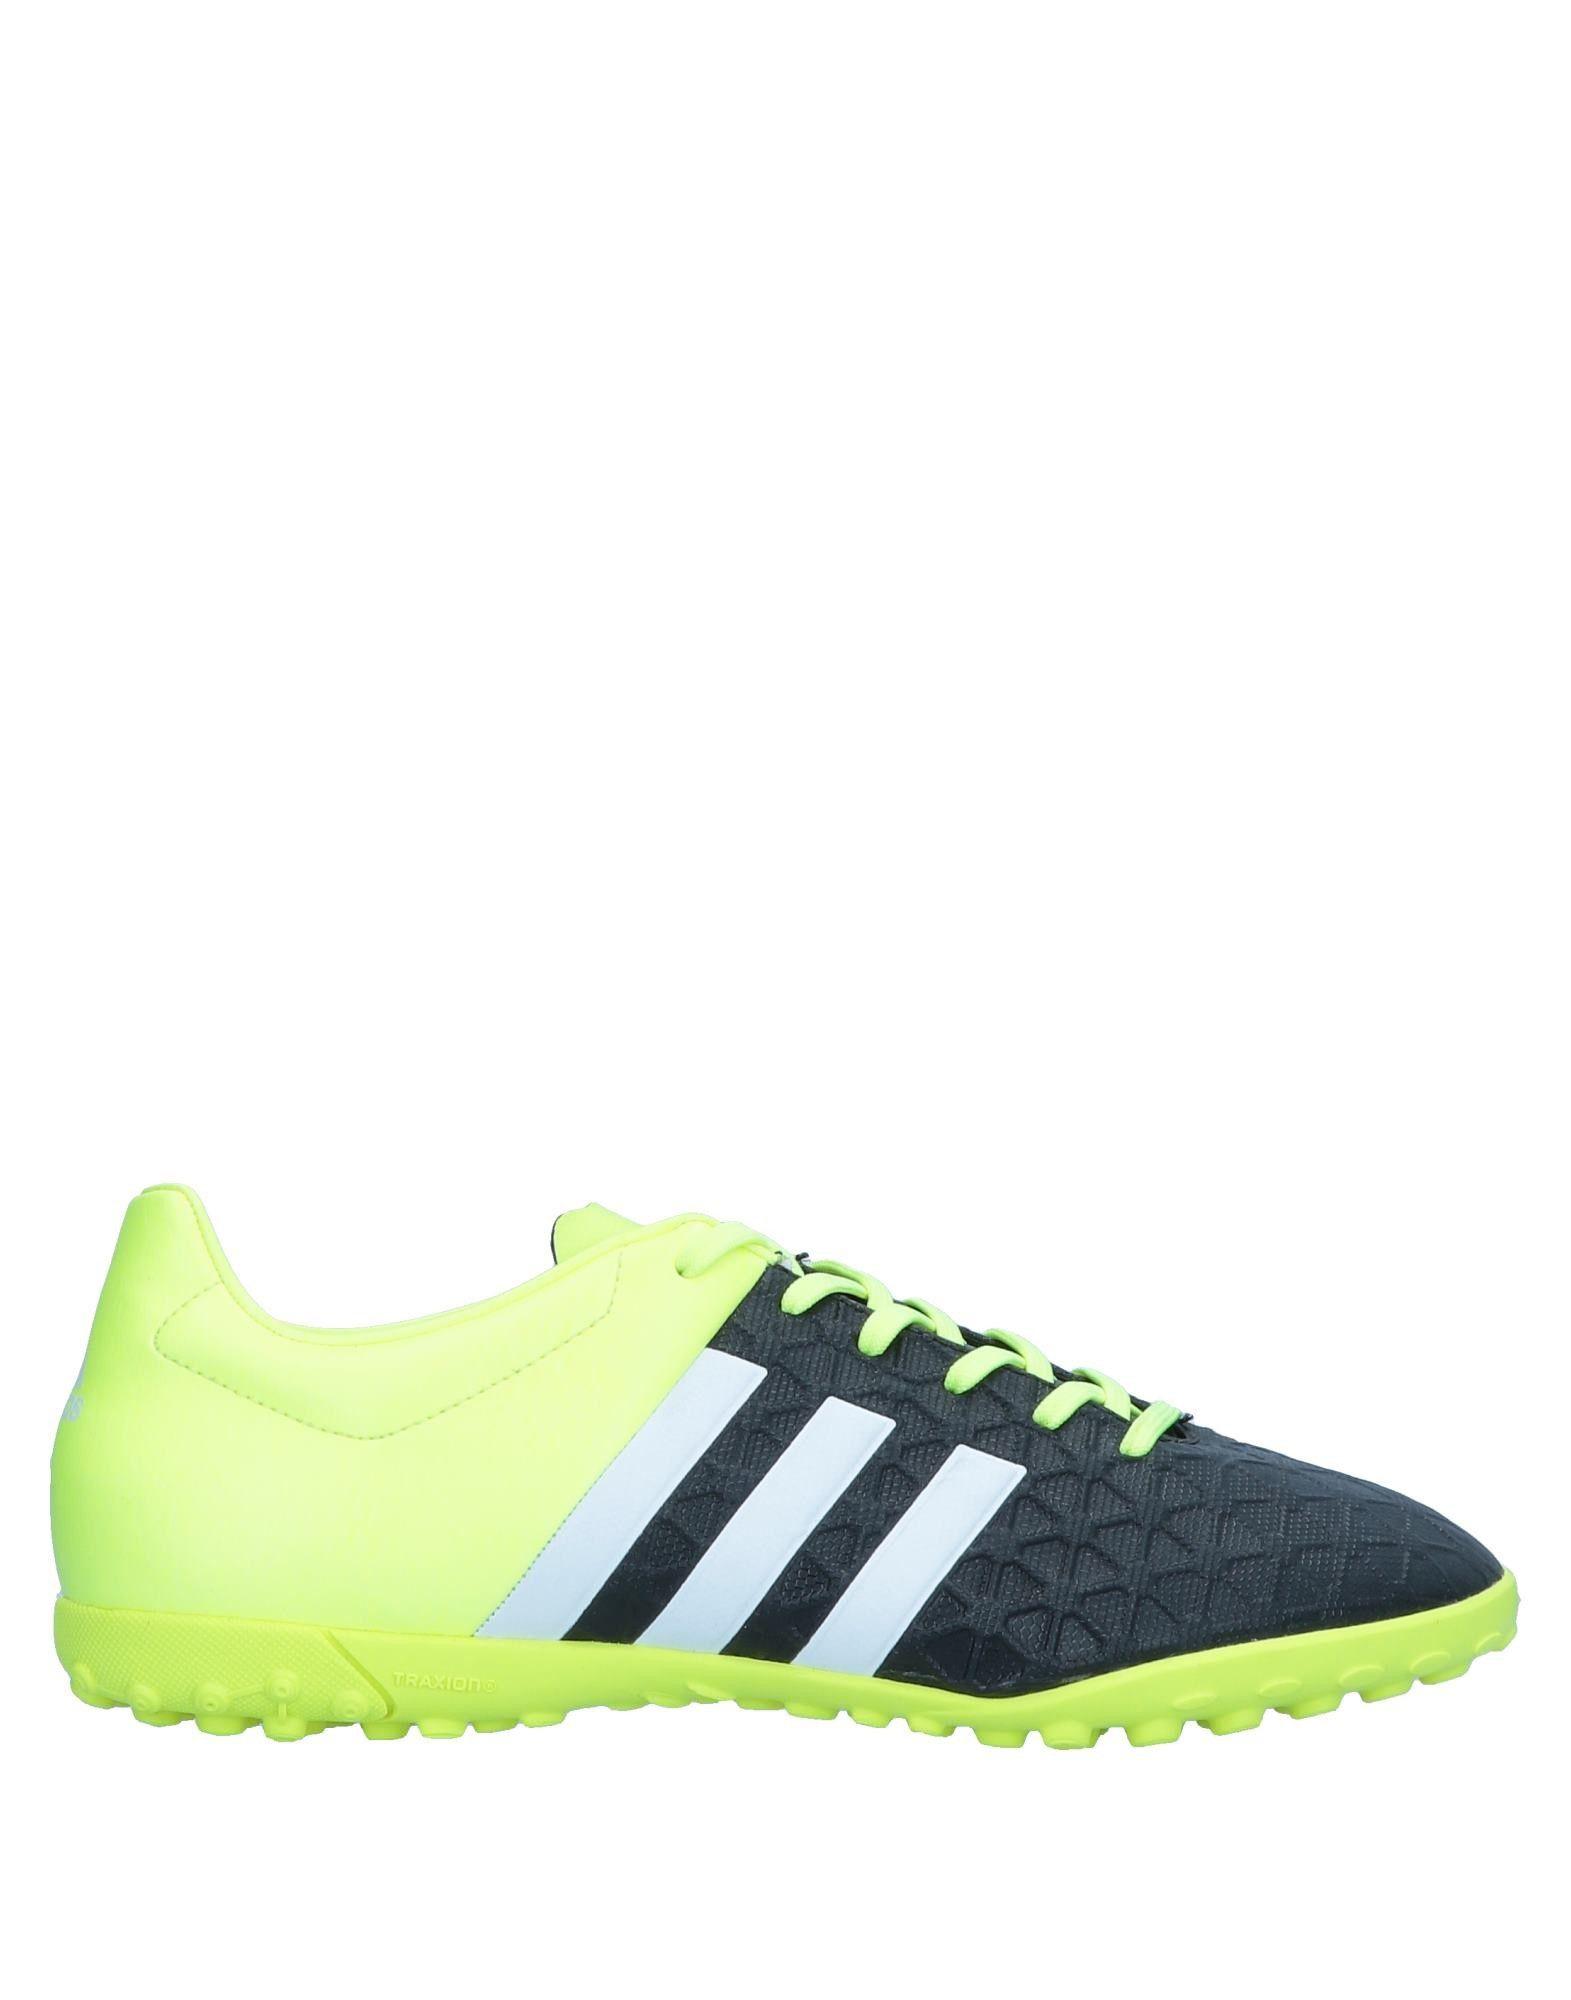 Adidas on Sneakers - Men Adidas Sneakers online on Adidas  Australia - 11553563HB dbe96b